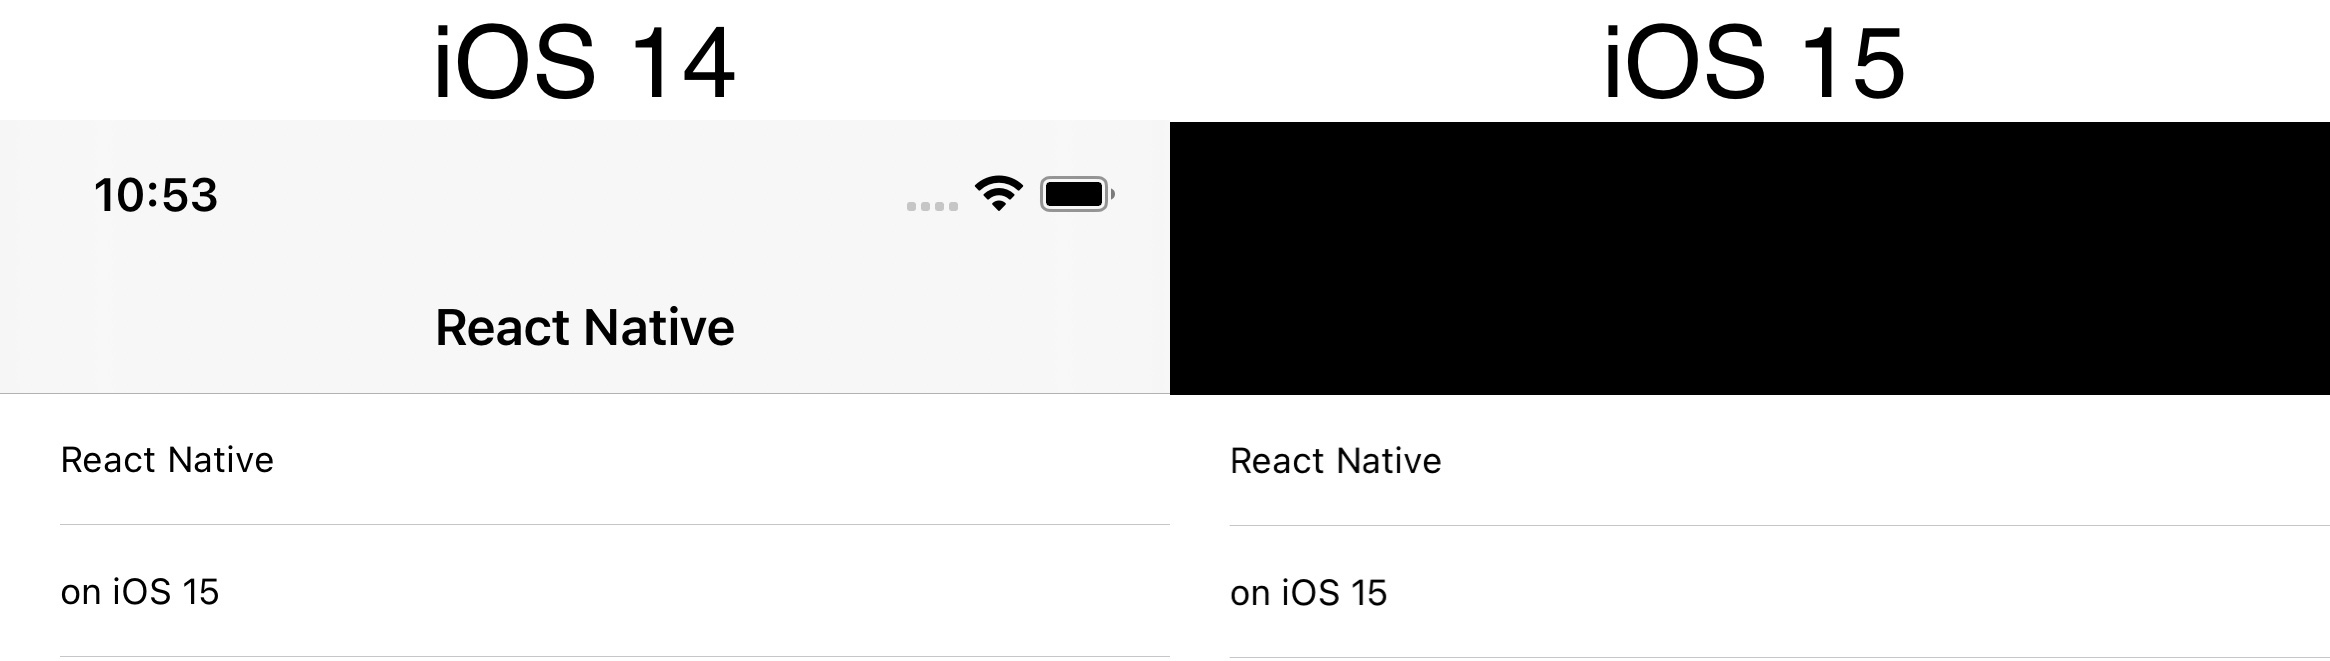 Screenshot of navigation bar on iOS 14 and iOS 15